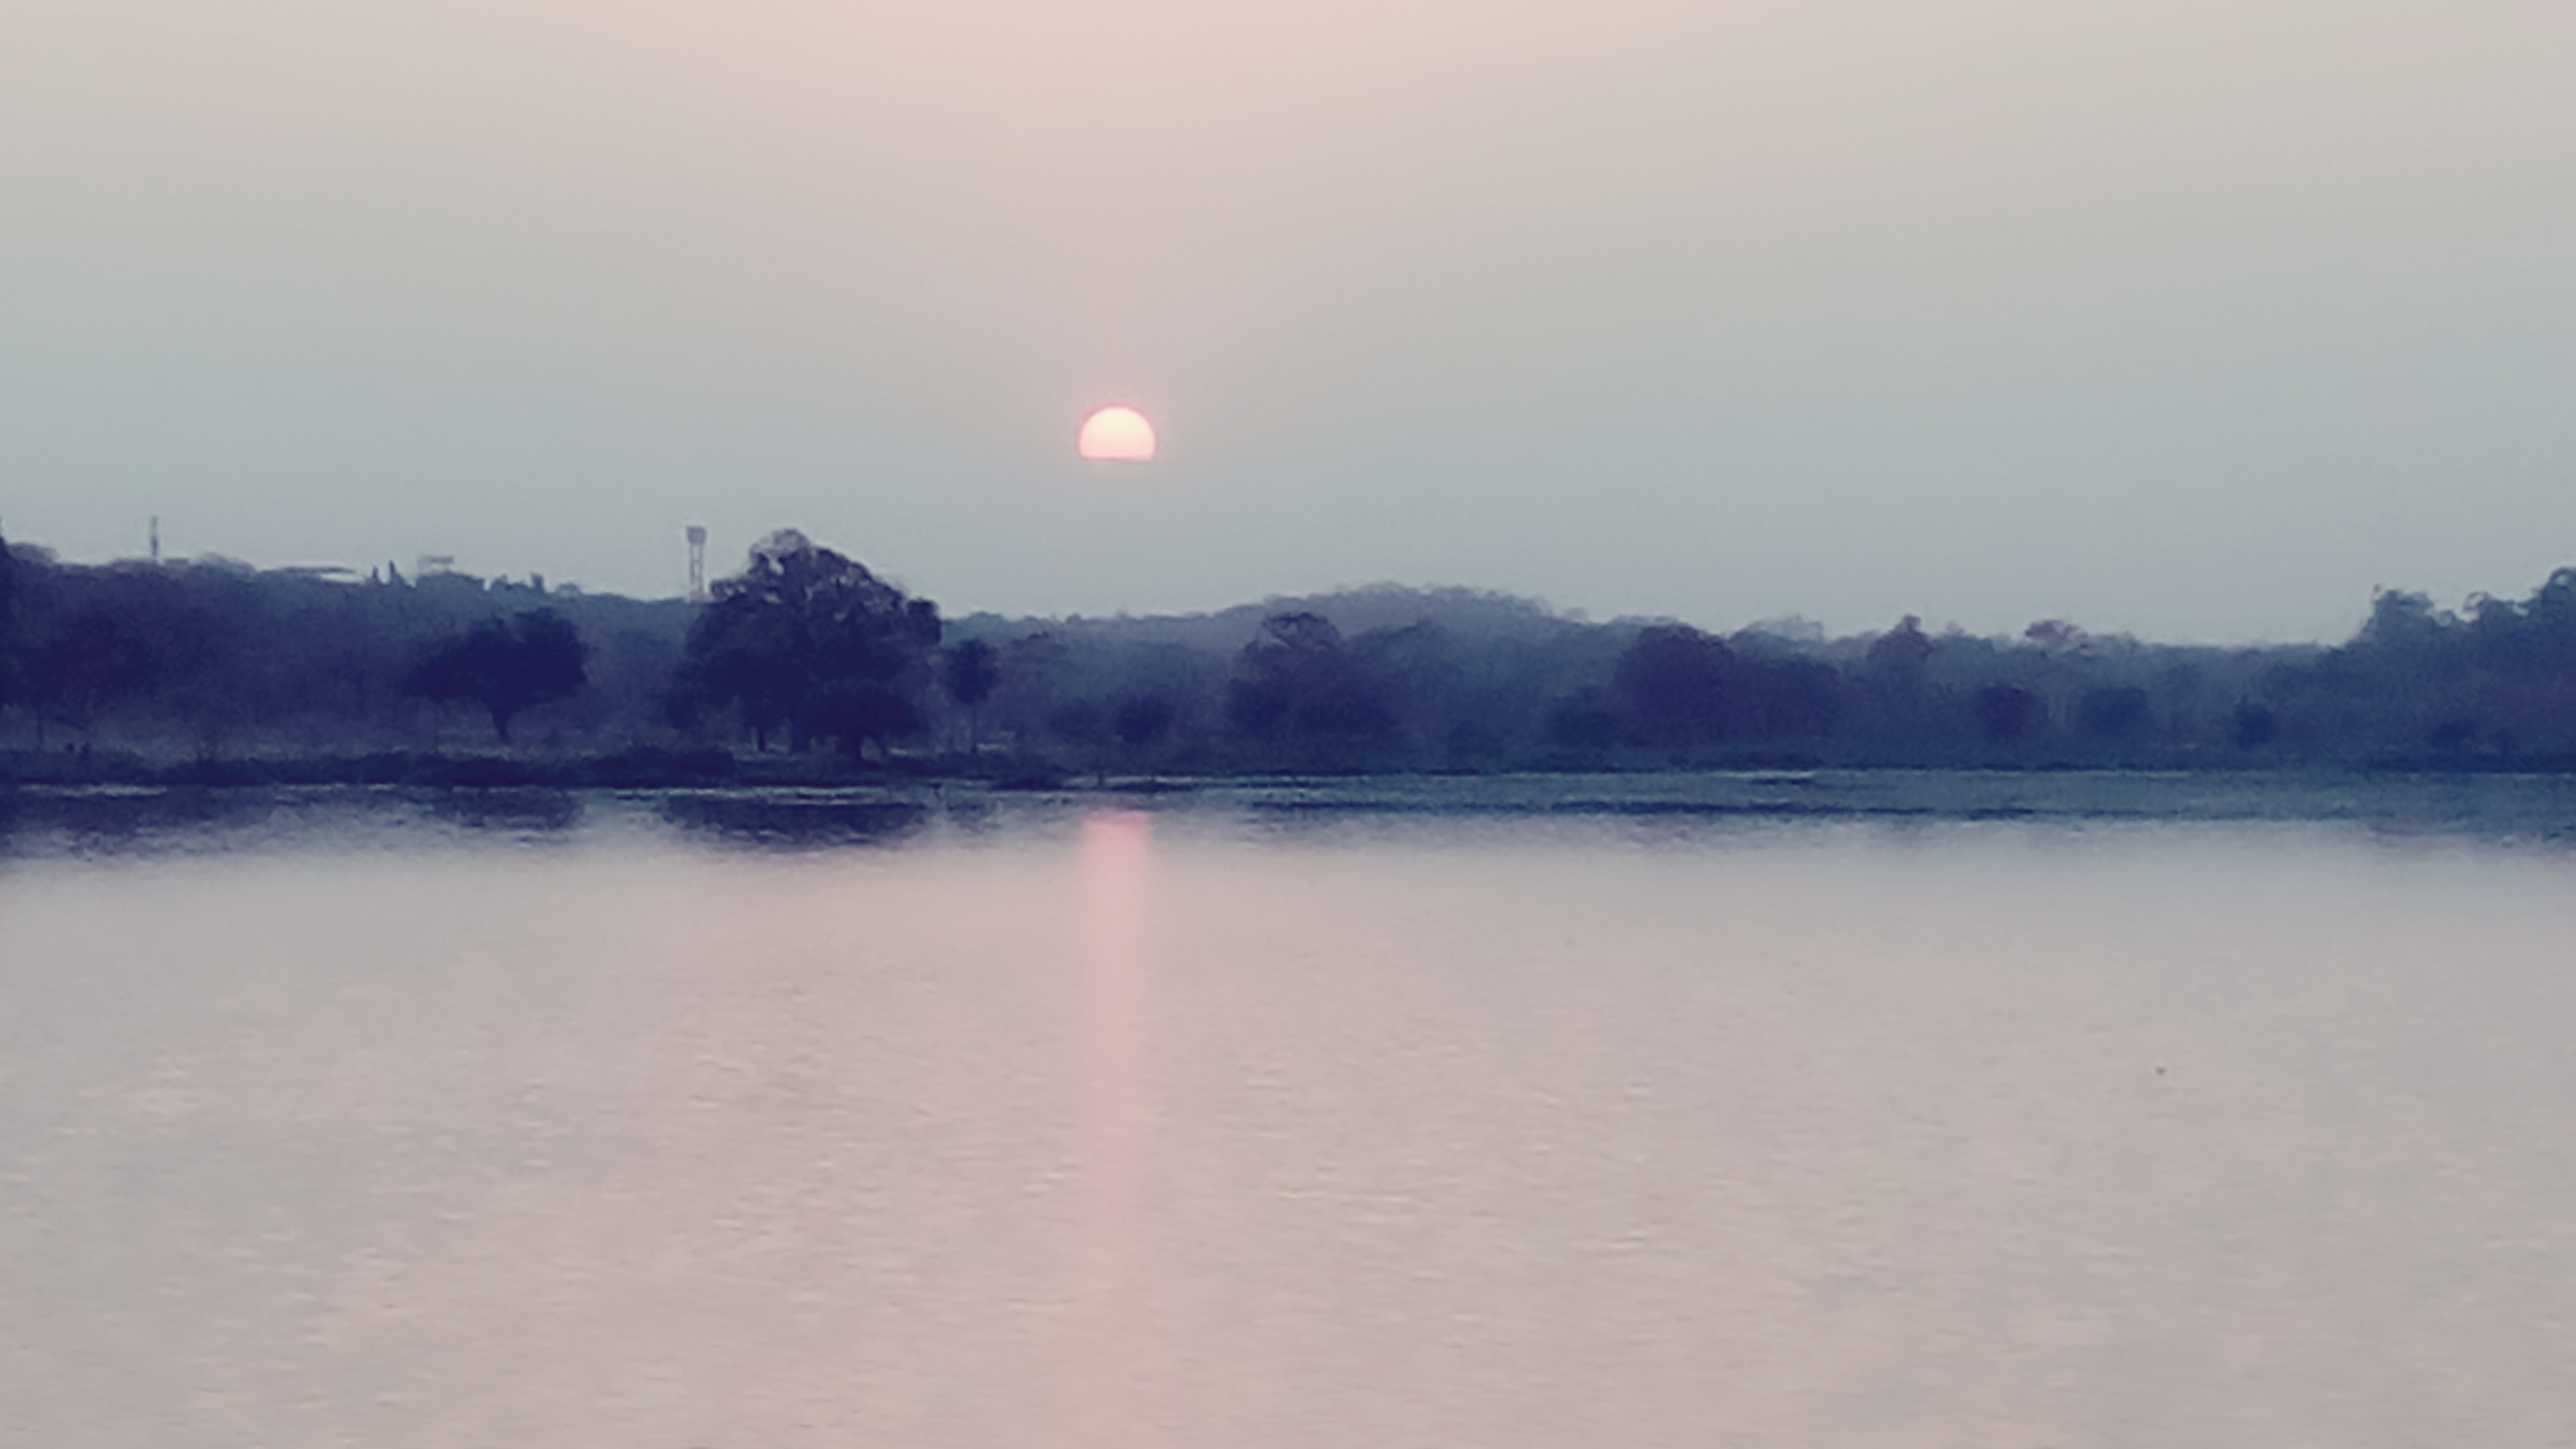 File:Futala Lake, Nagpur jpg - Wikimedia Commons